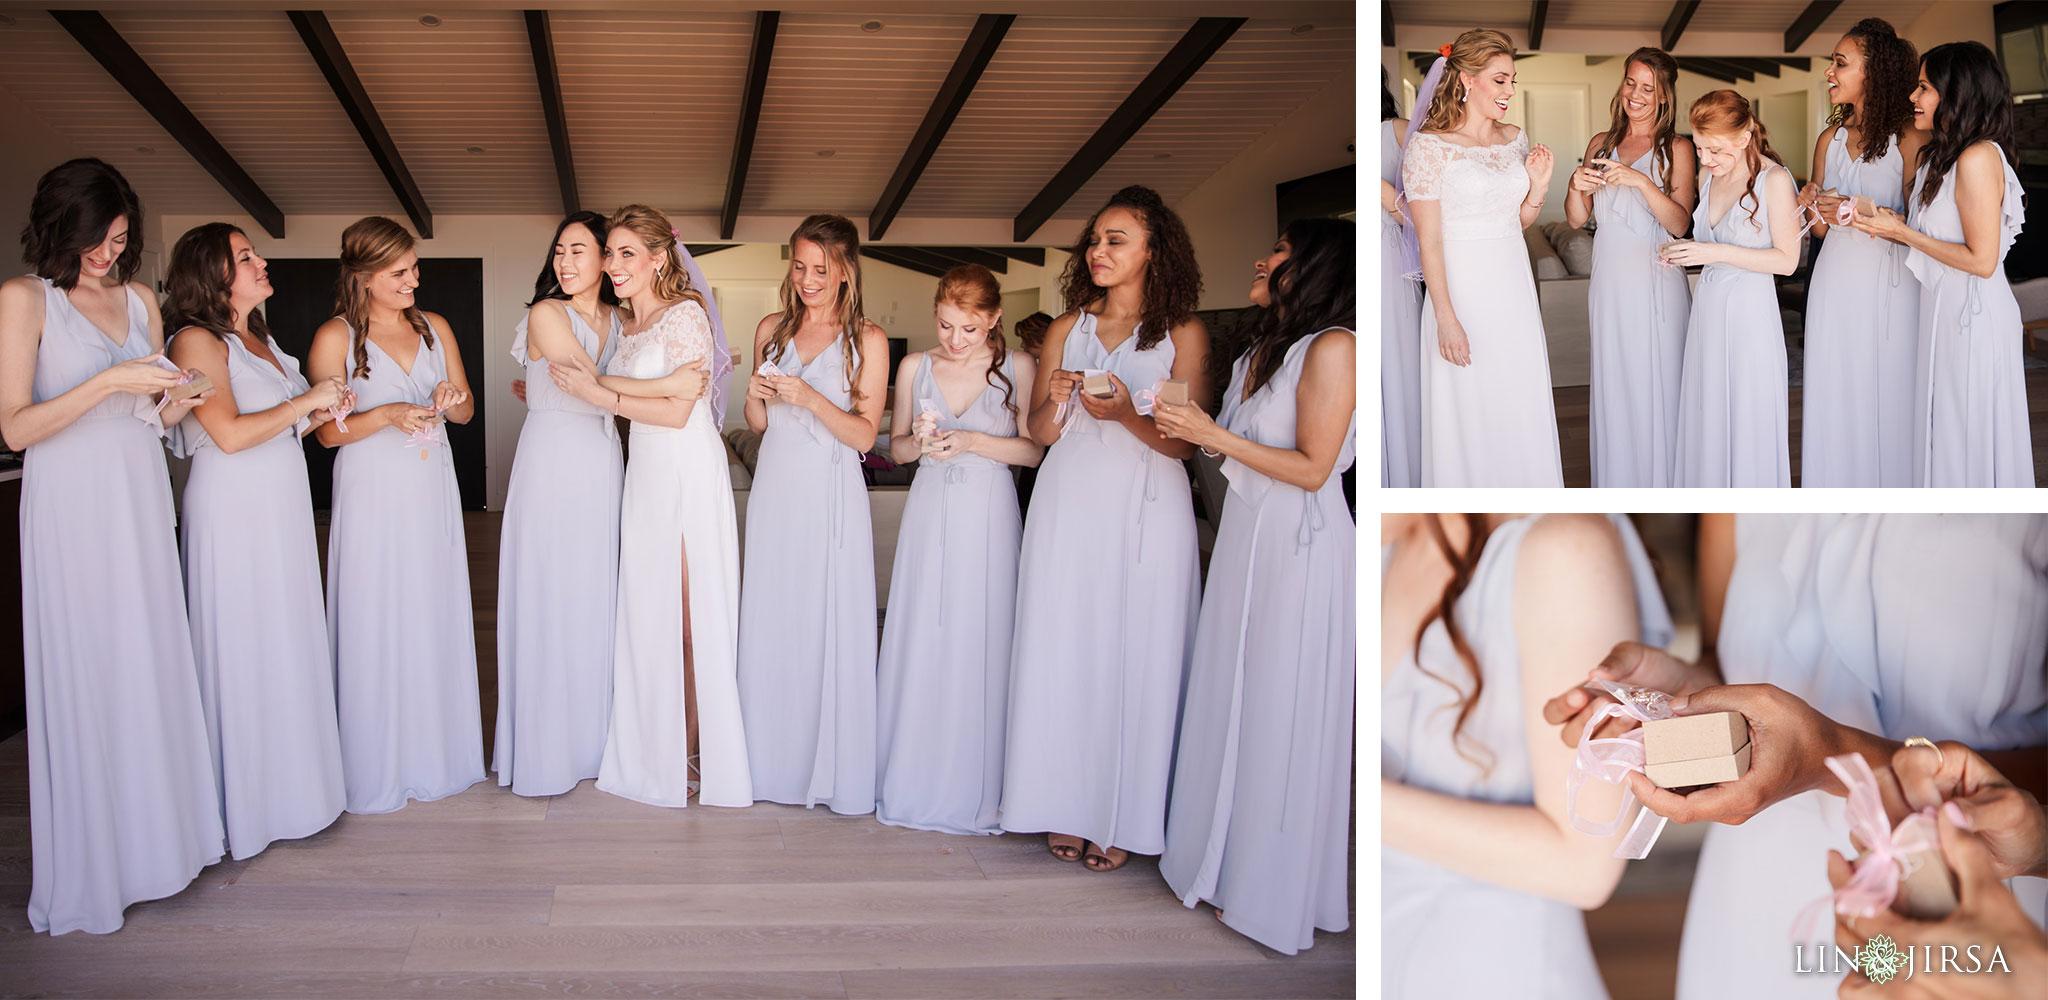 04 palos verdes wedding photography